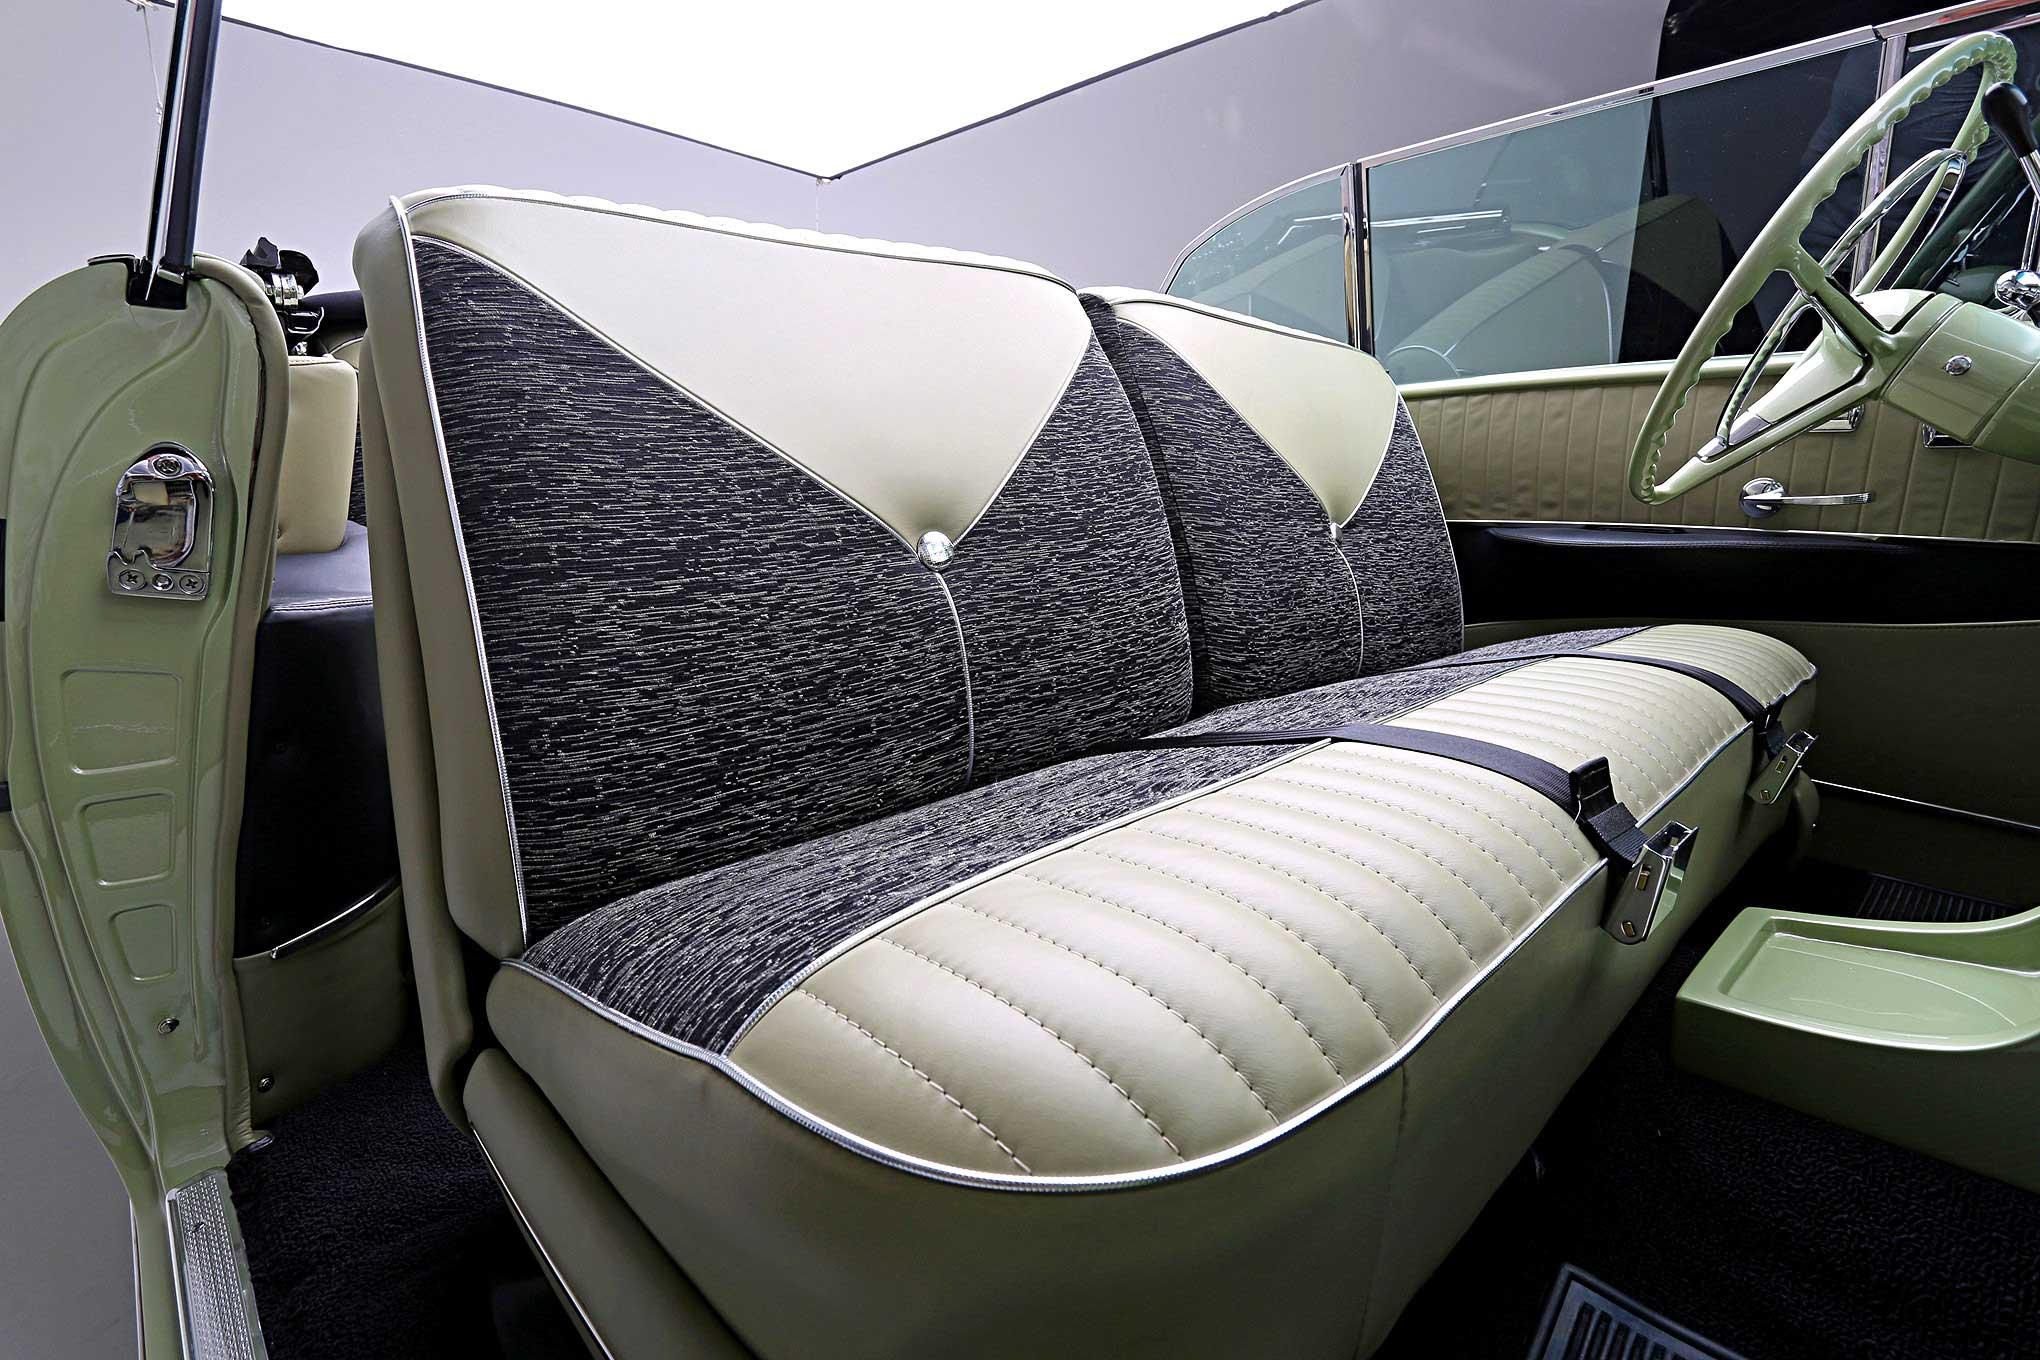 1956 Chevrolet Bel Air Bench Seat Lowrider